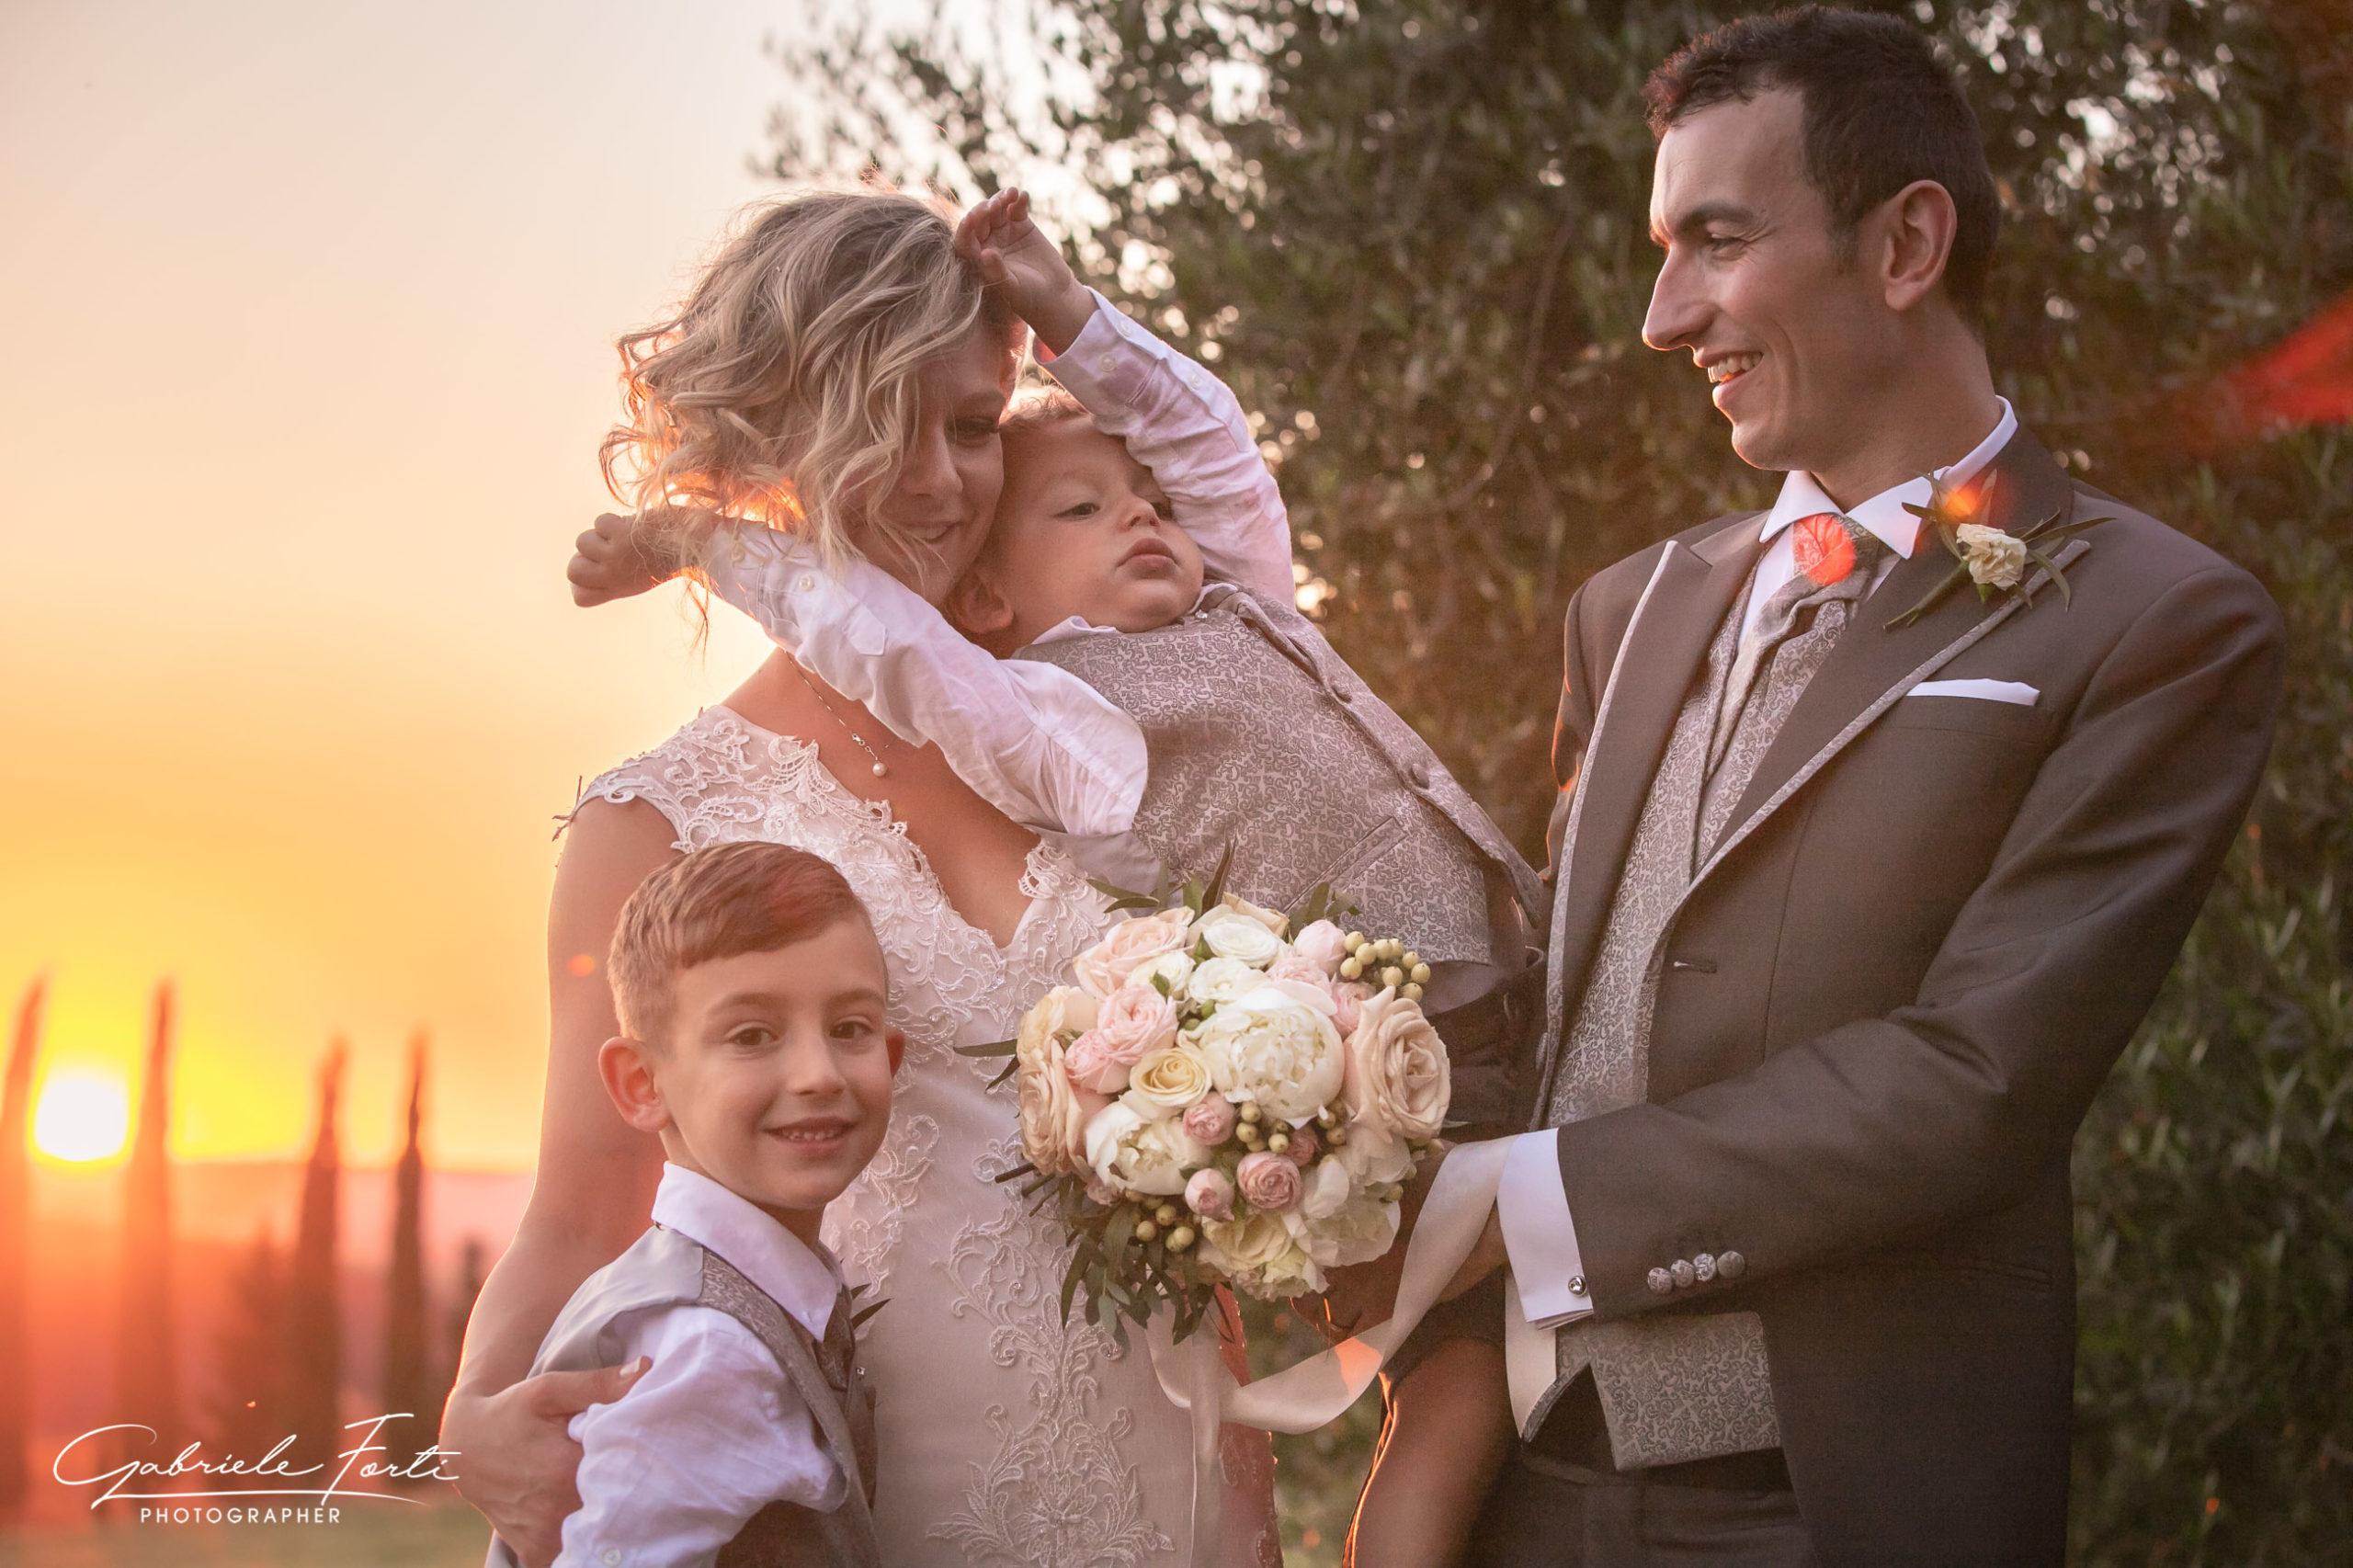 wedding-siena-val-d'orcoa-la-rimbecca-photographer-foto-forti-gabriele-2